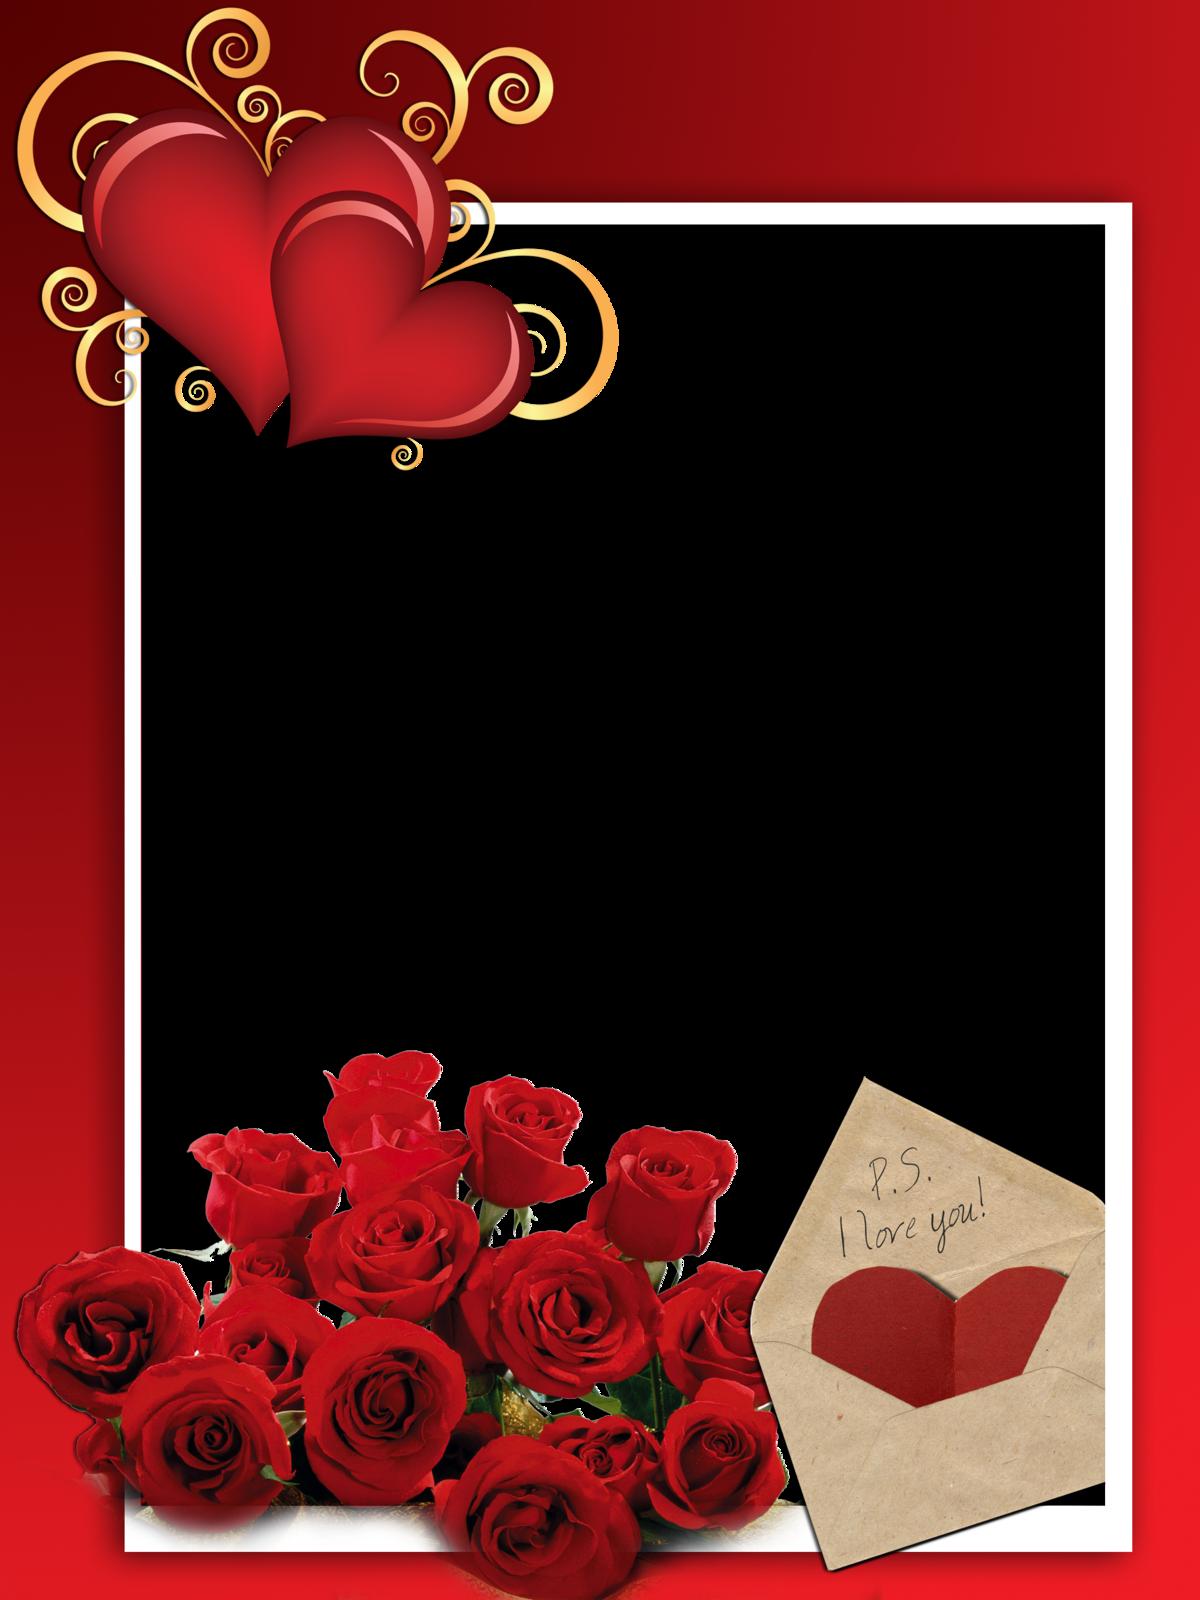 Шаблоны влюбленных для открыток